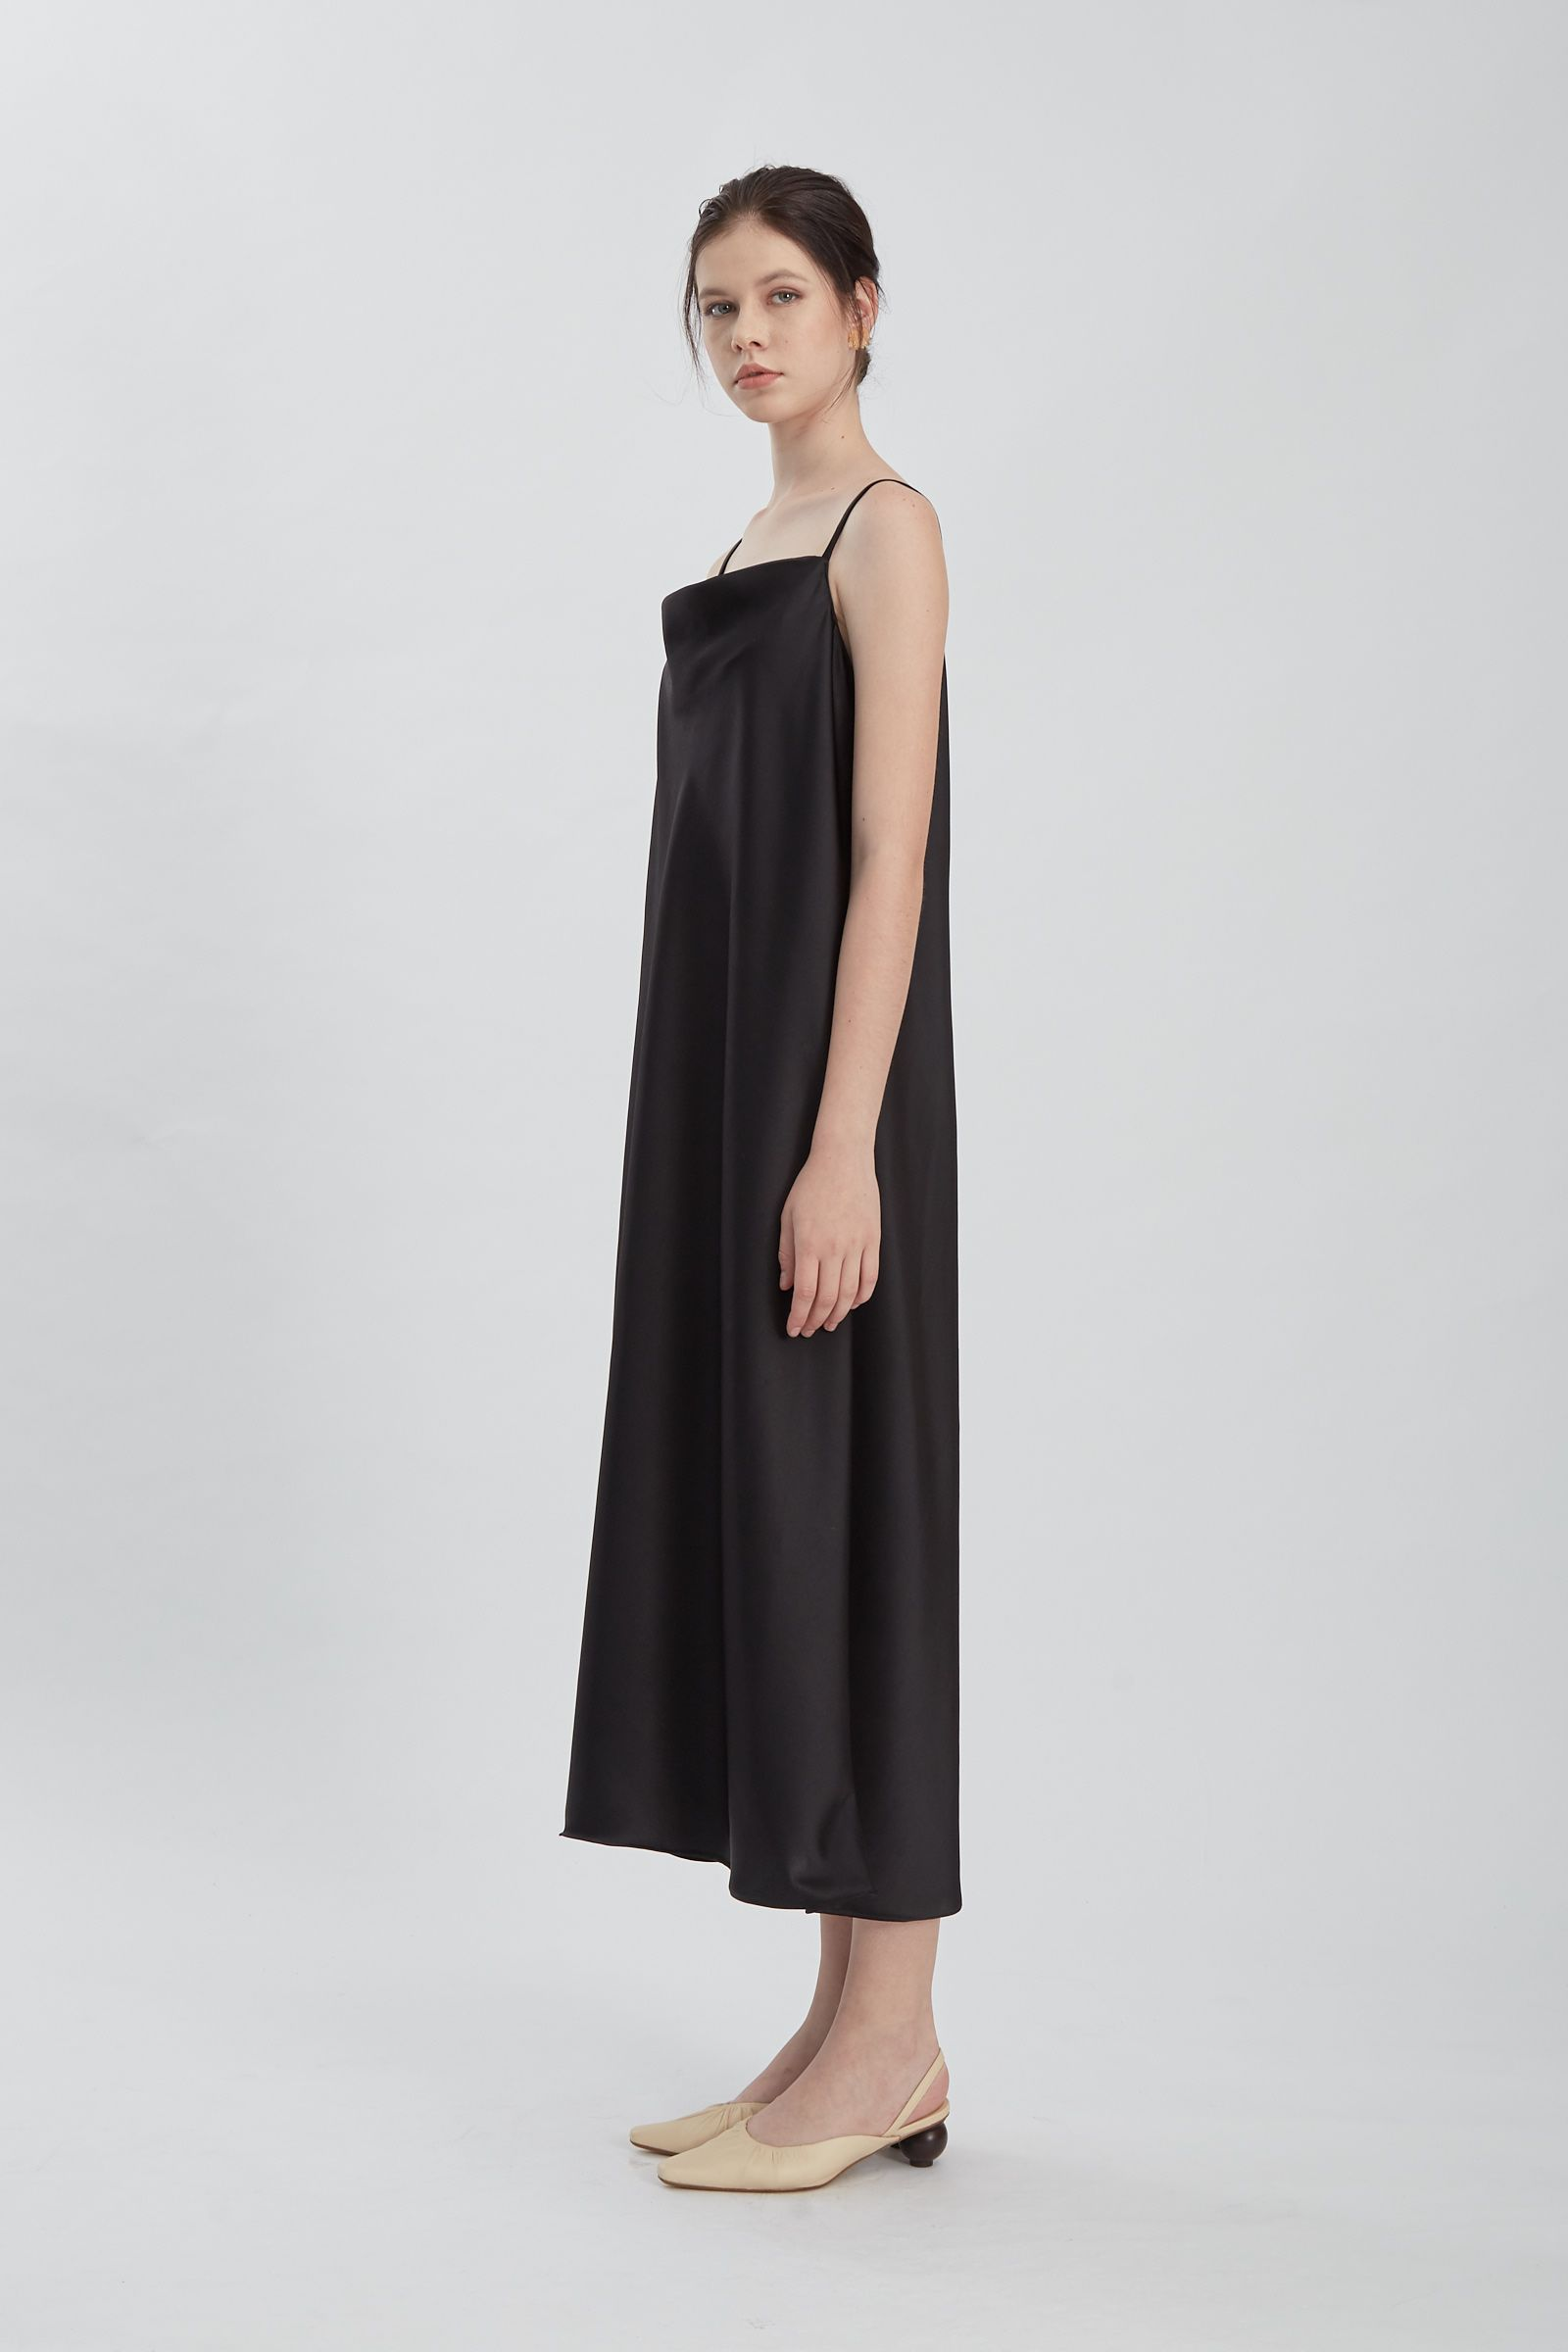 #PopbelaOOTD: Dress Hitam ini Buatmu Terlihat Makin Seksi!